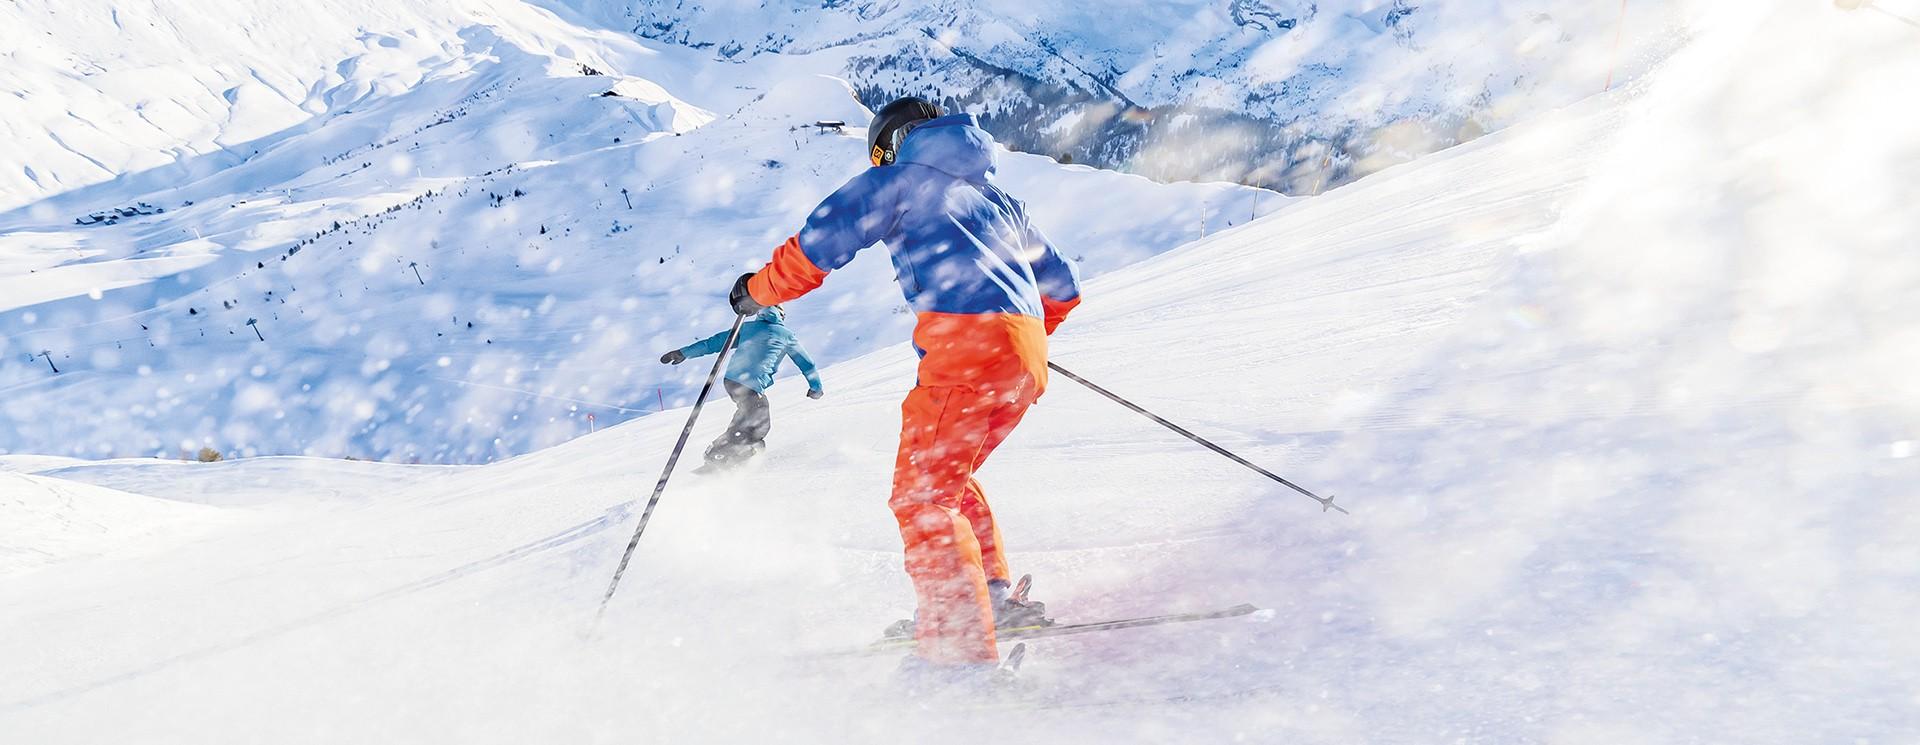 ski-le-grand-bornand-aravis-alpcat-medias-201907